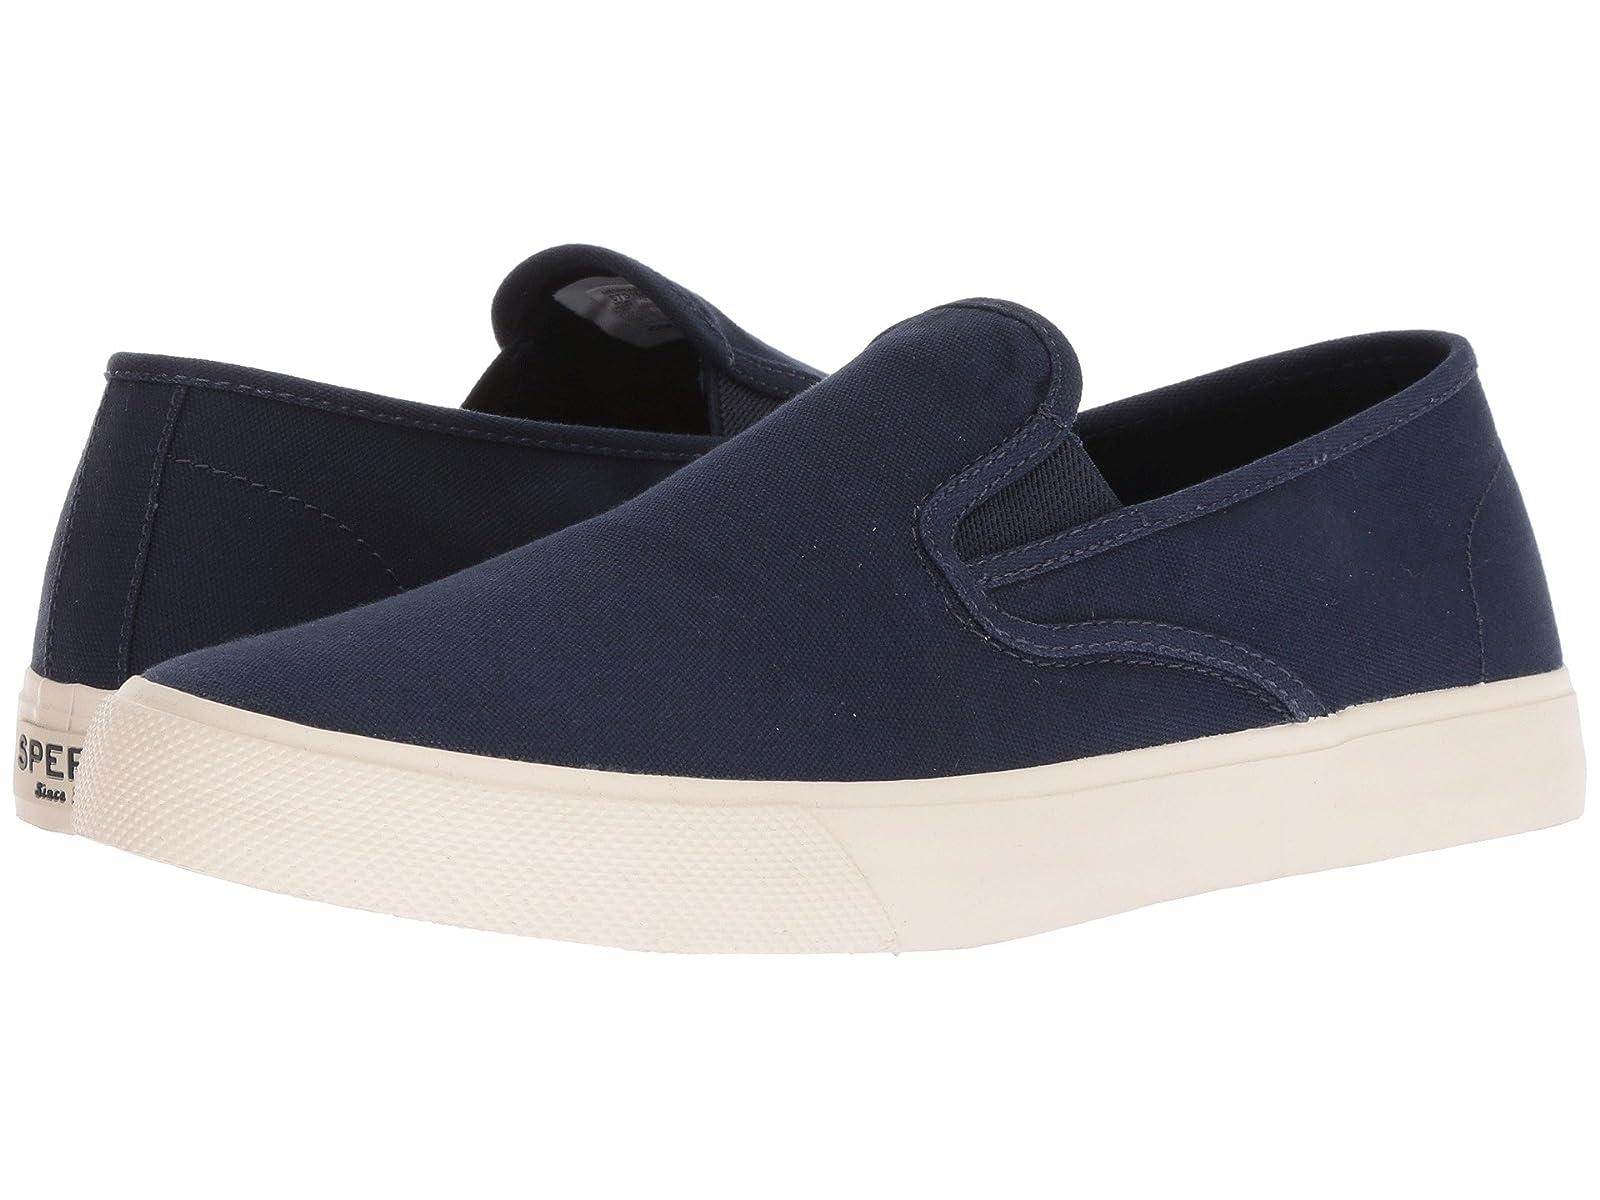 Sperry Captain's Slip-OnAtmospheric grades have affordable shoes